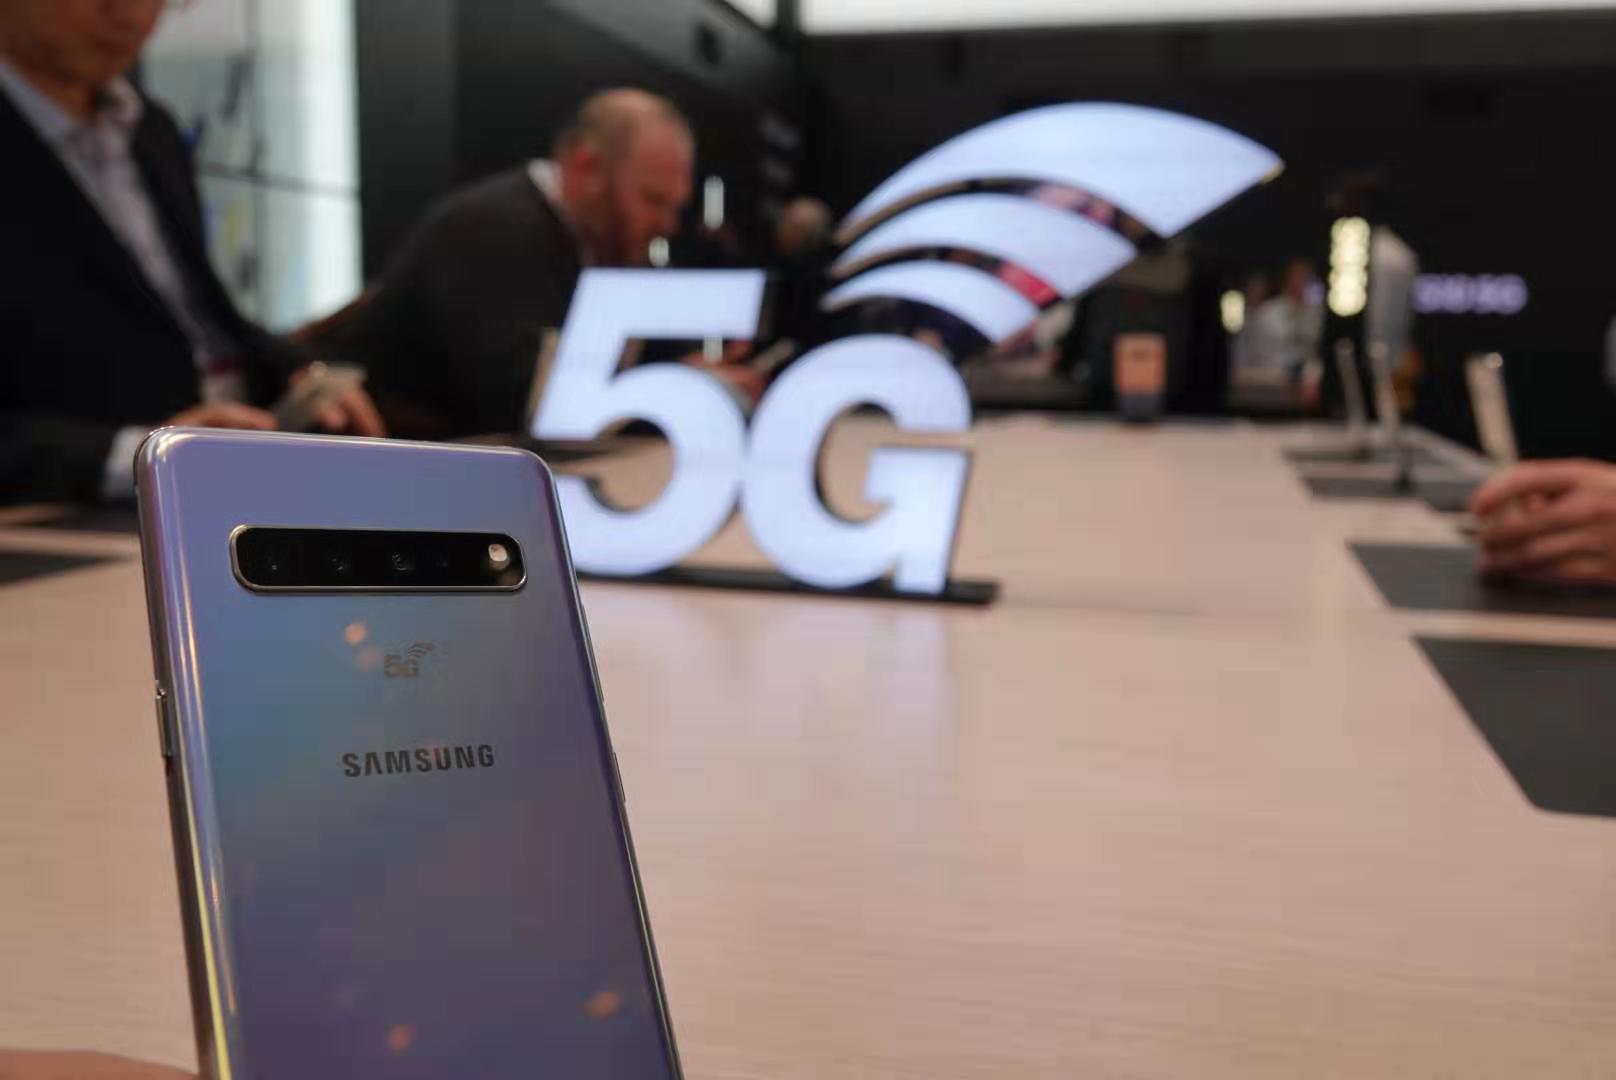 Galaxy S10五日在韩国上市 配合5G推出相应功能